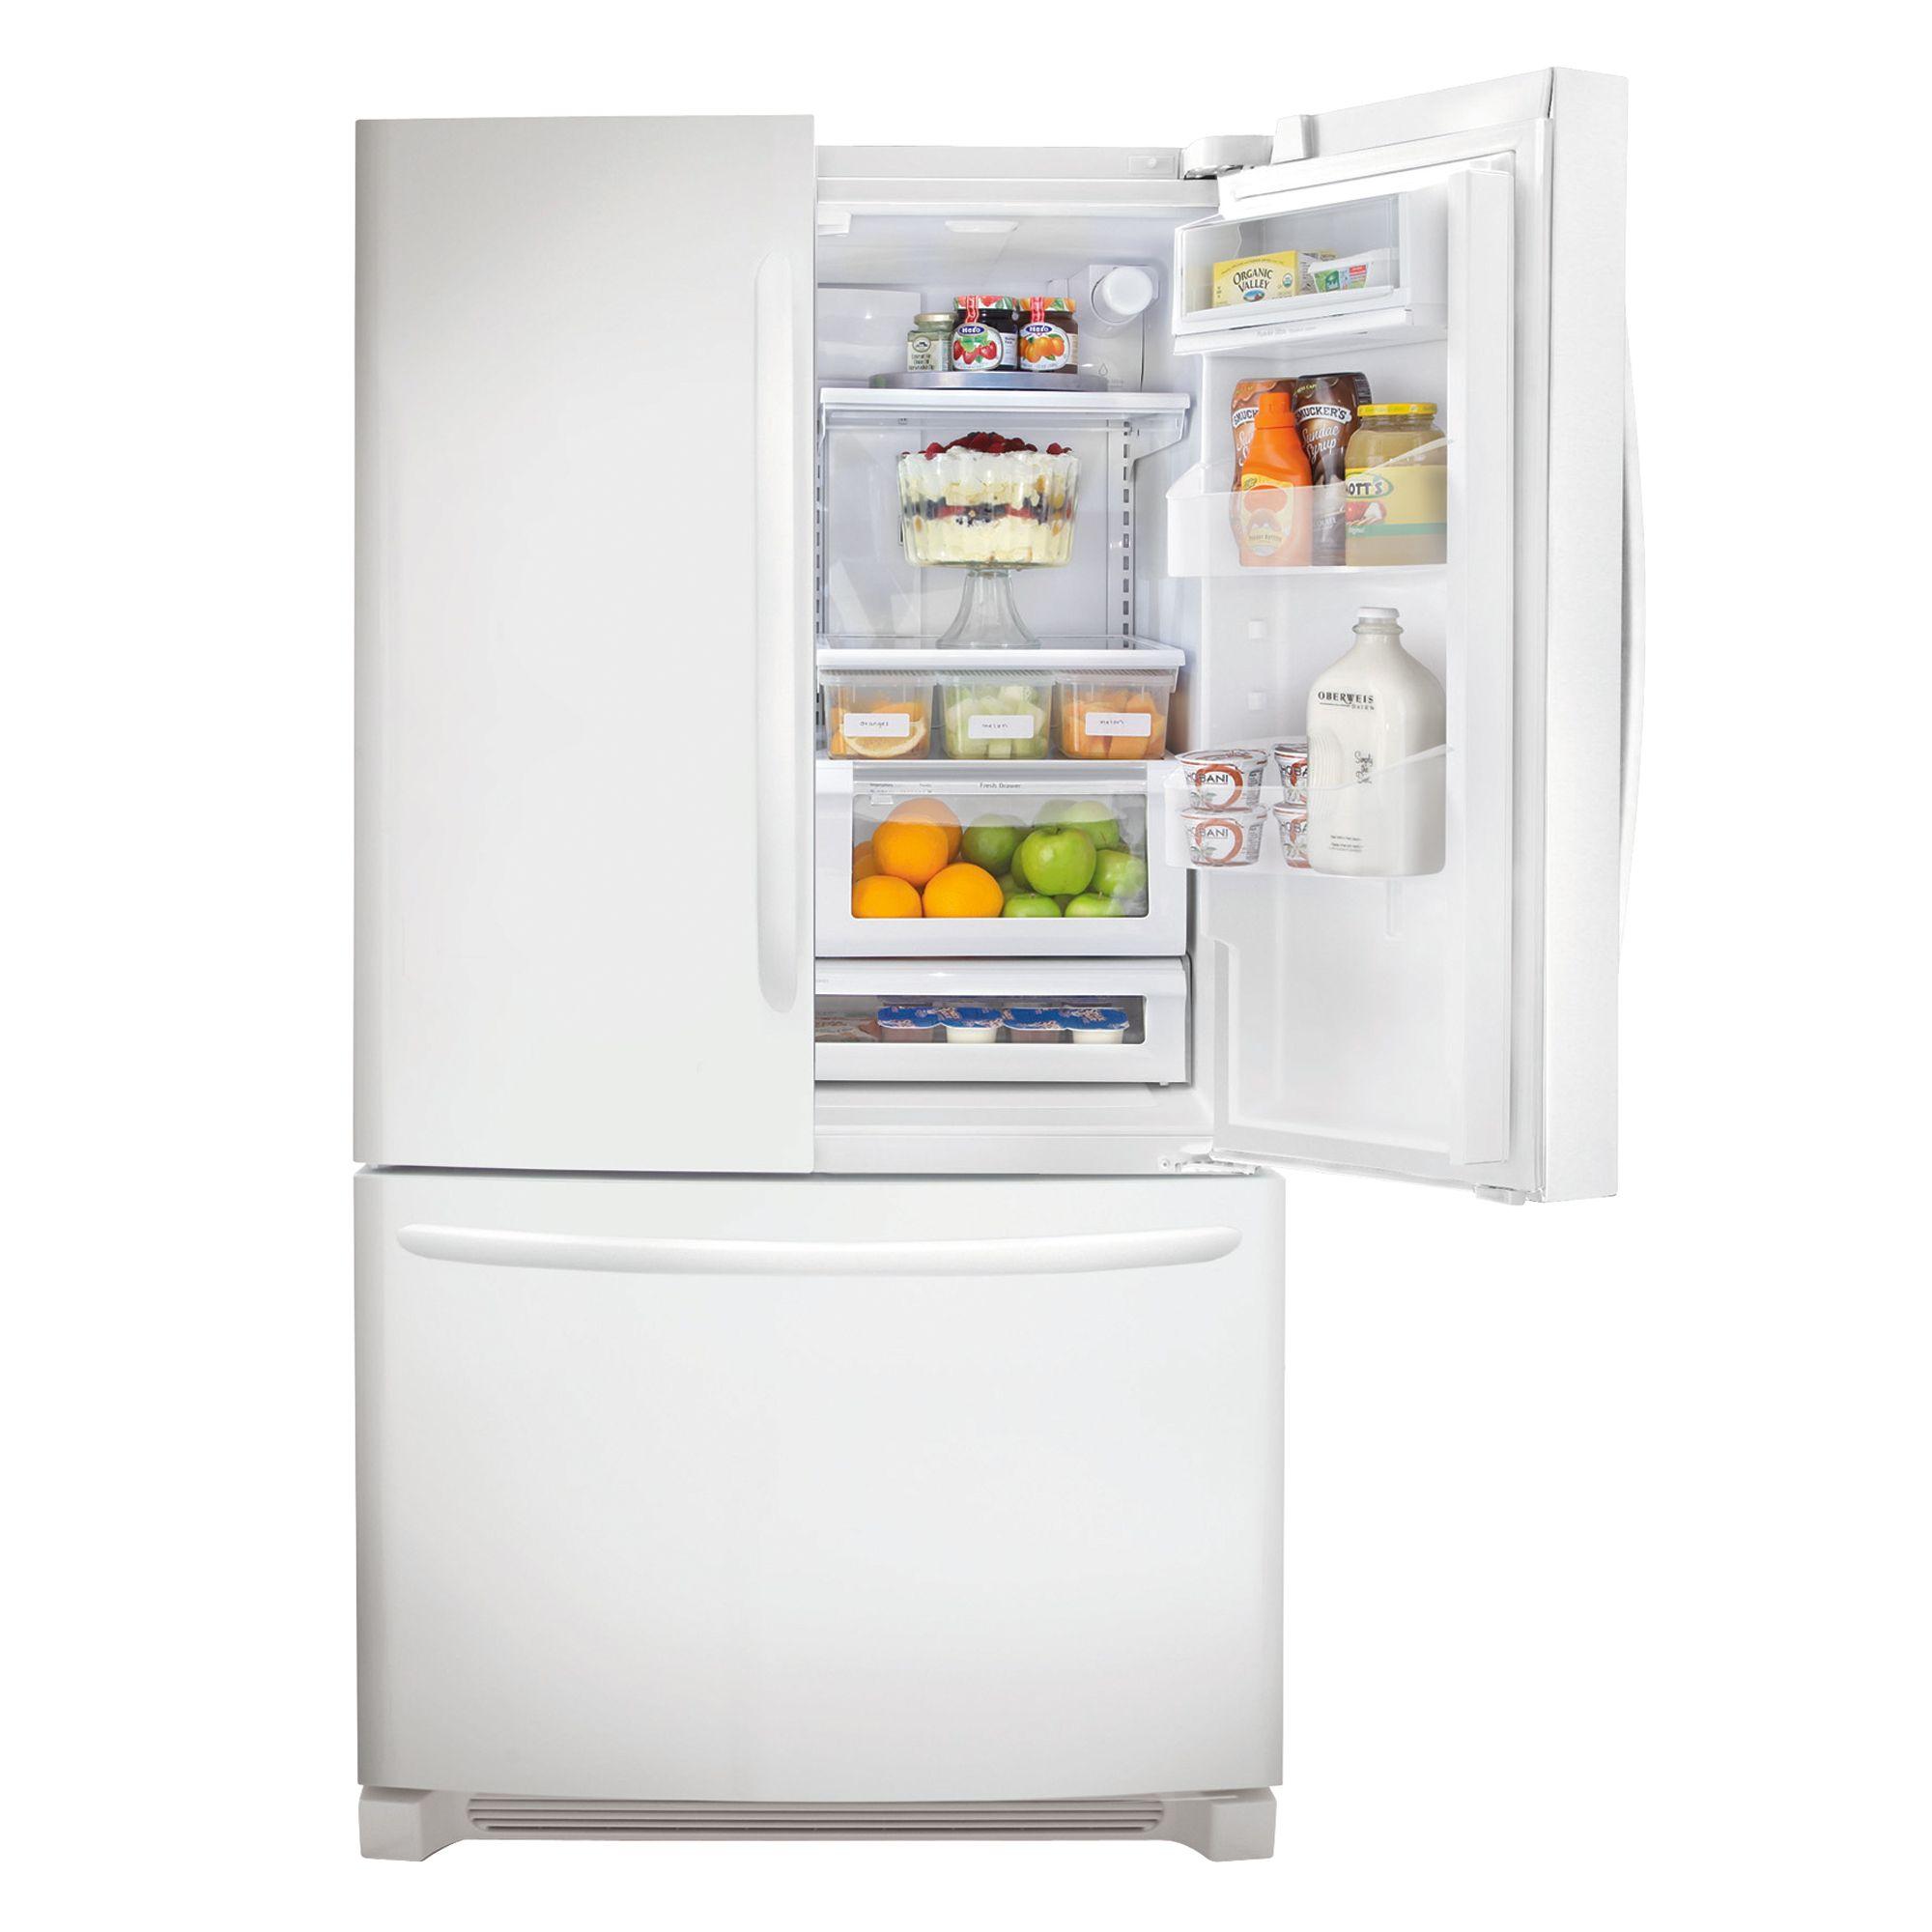 Frigidaire 25.8 cu. ft. French-Door Bottom-Freezer Refrigerator (FGUN2642L)